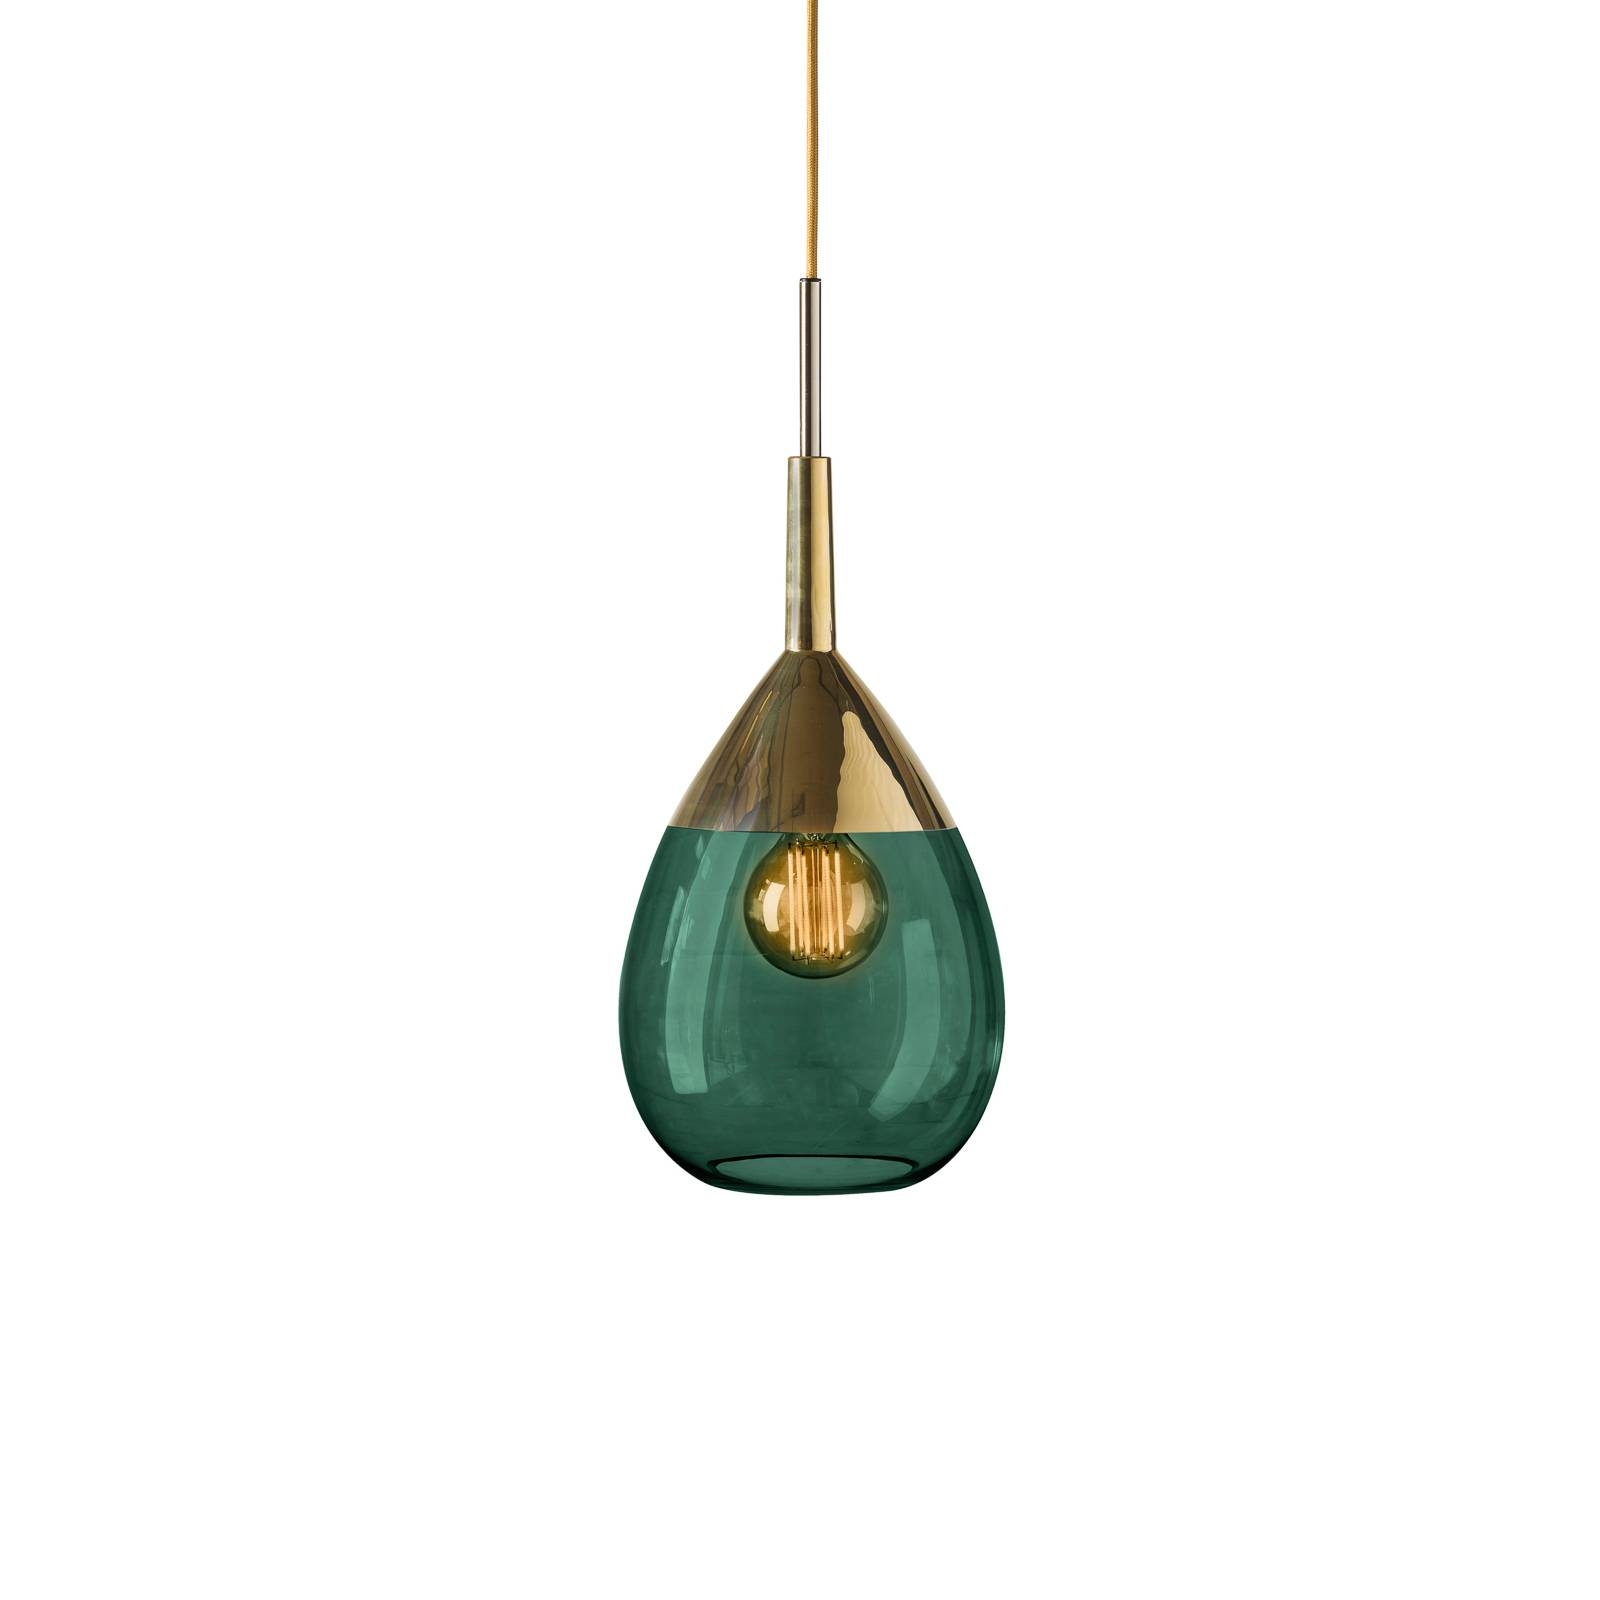 EBB & FLOW Lute suspension ivy green/gold Ø 22 cm